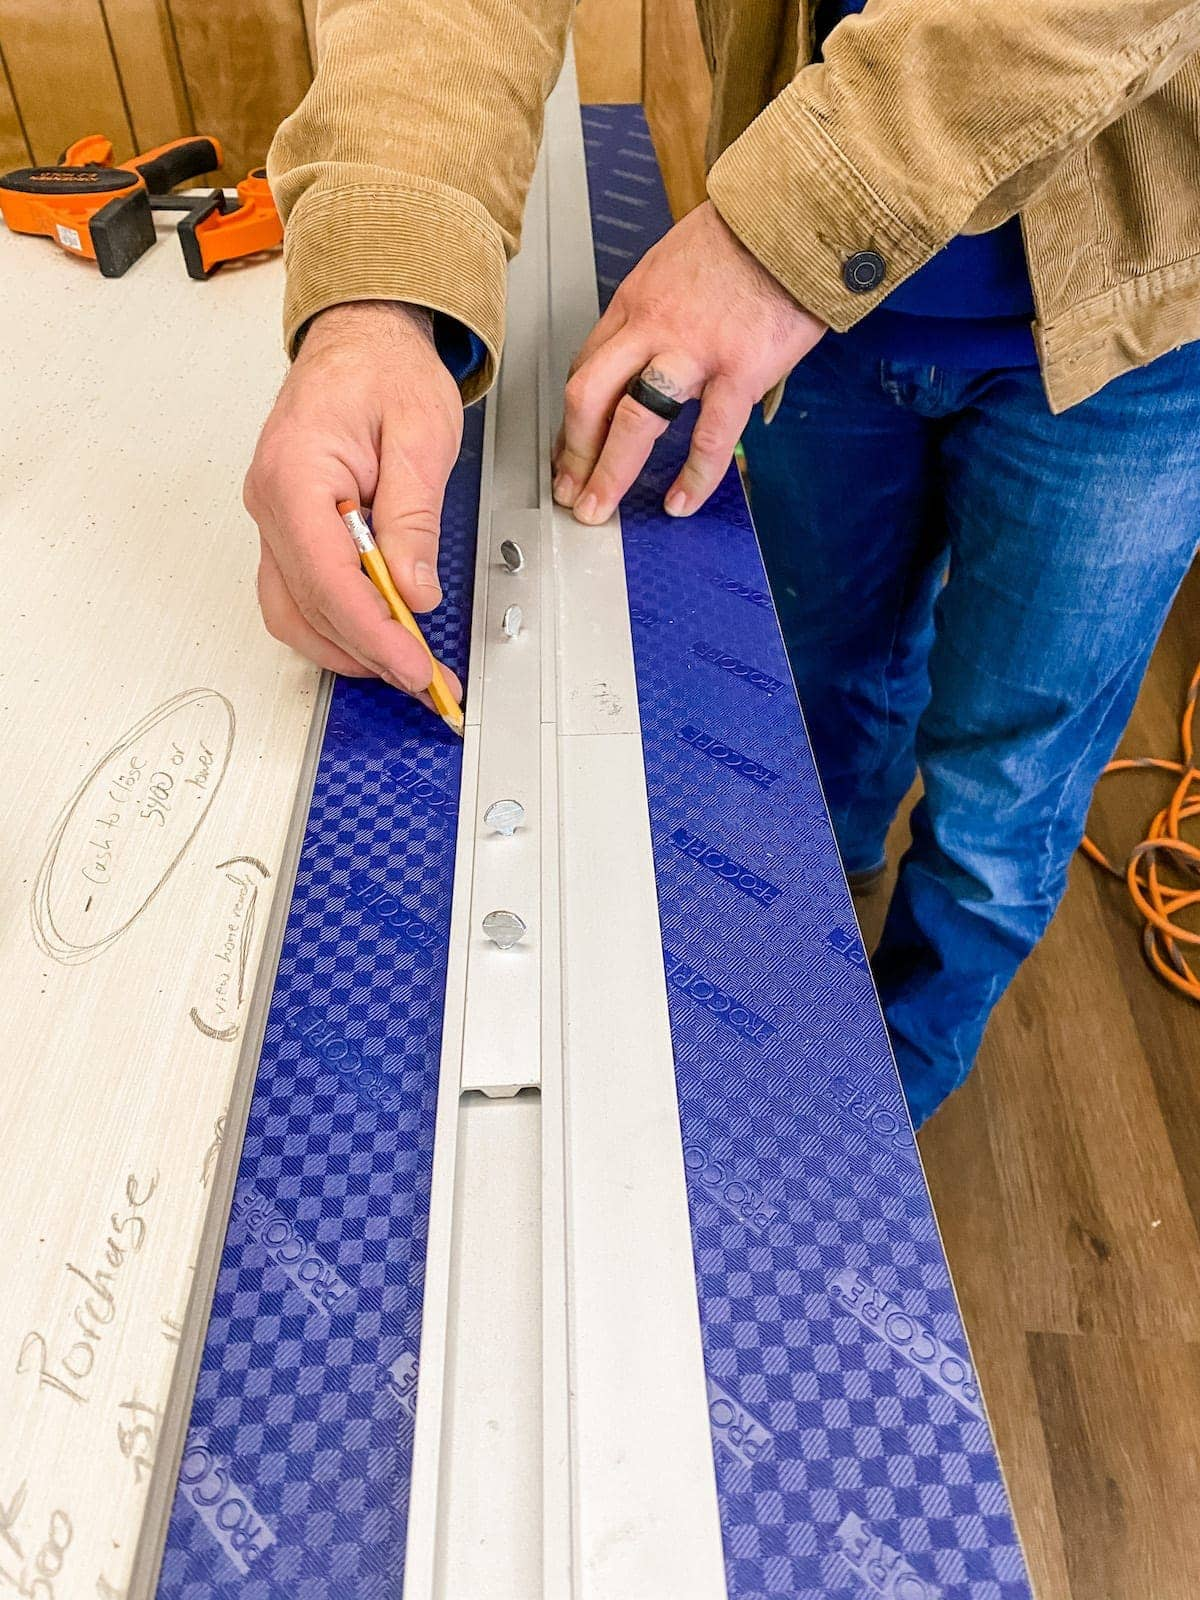 Using a straight edge to cut luxury vinyl plank flooring